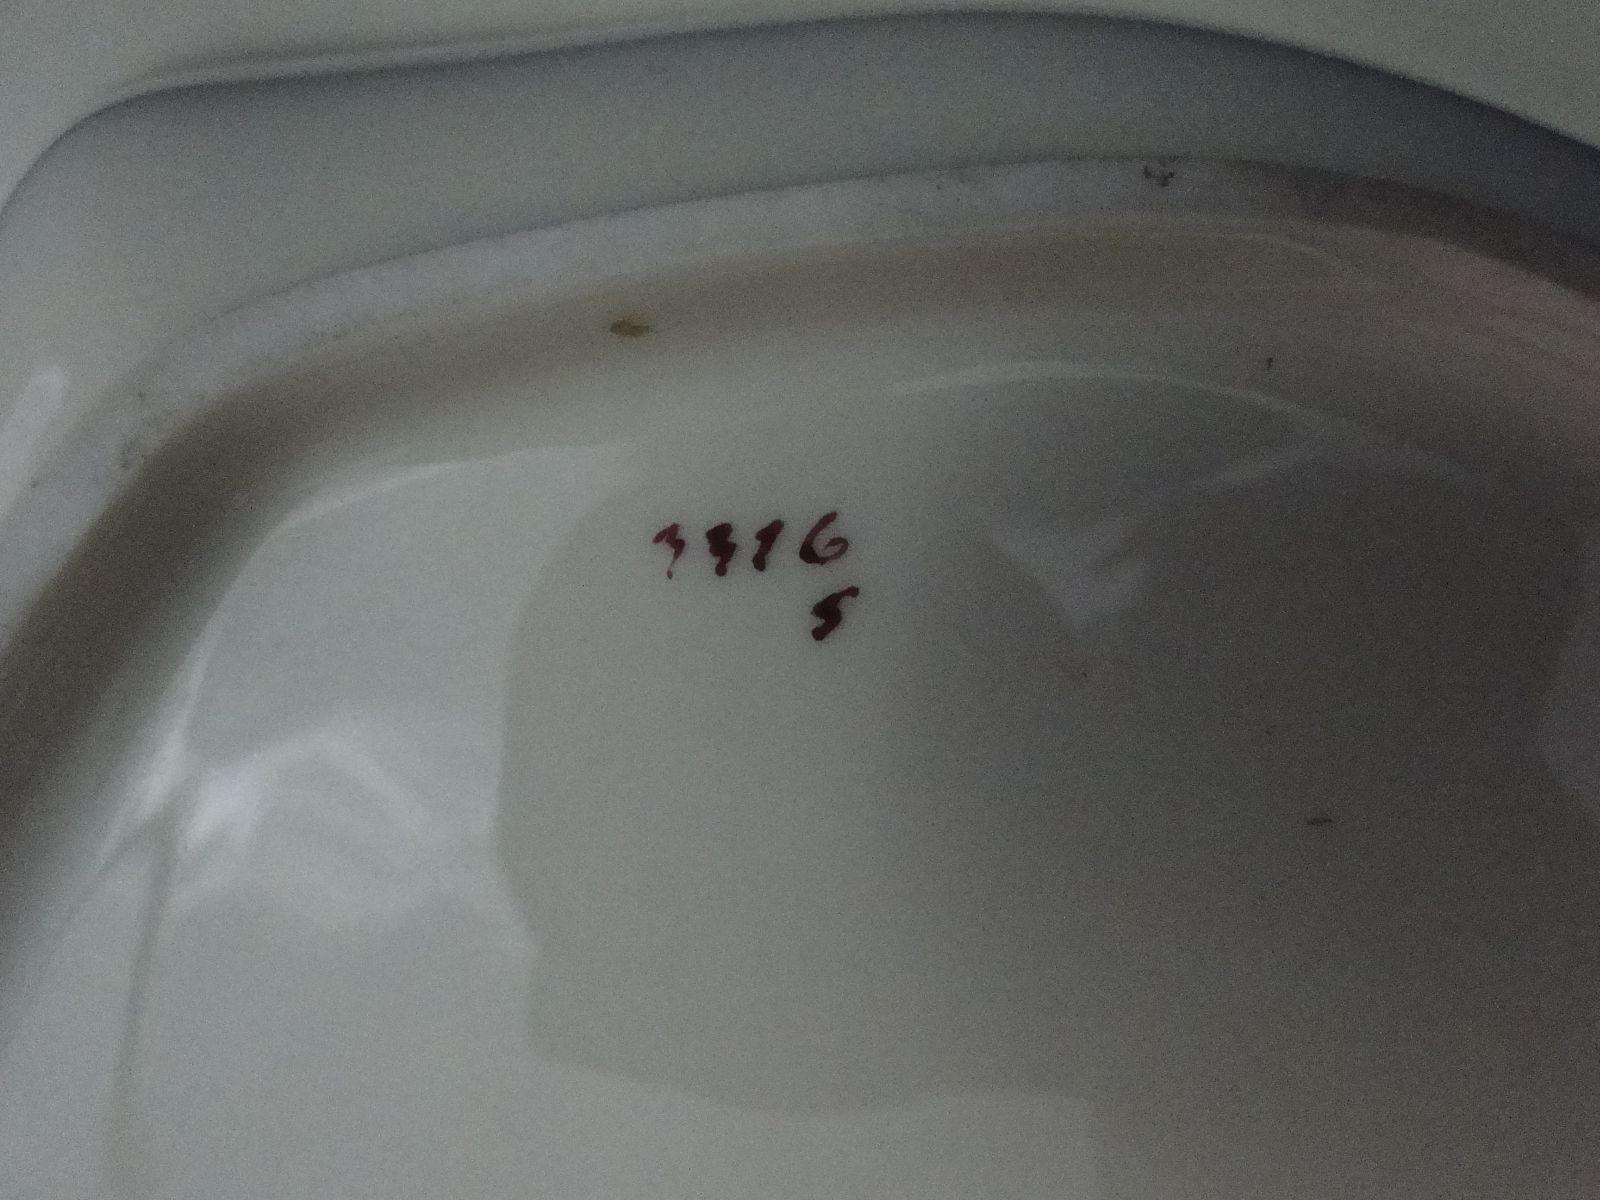 DSC01263.JPG (1600×1200)